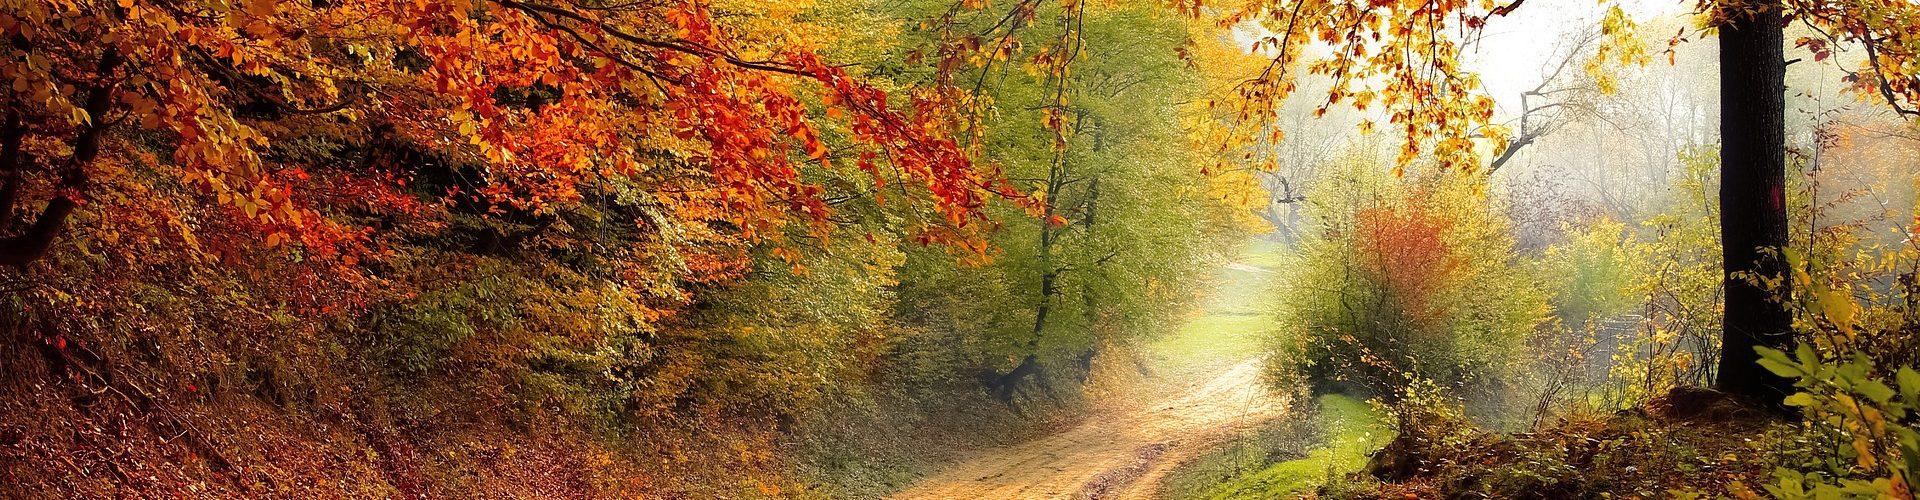 road-1072823_1920